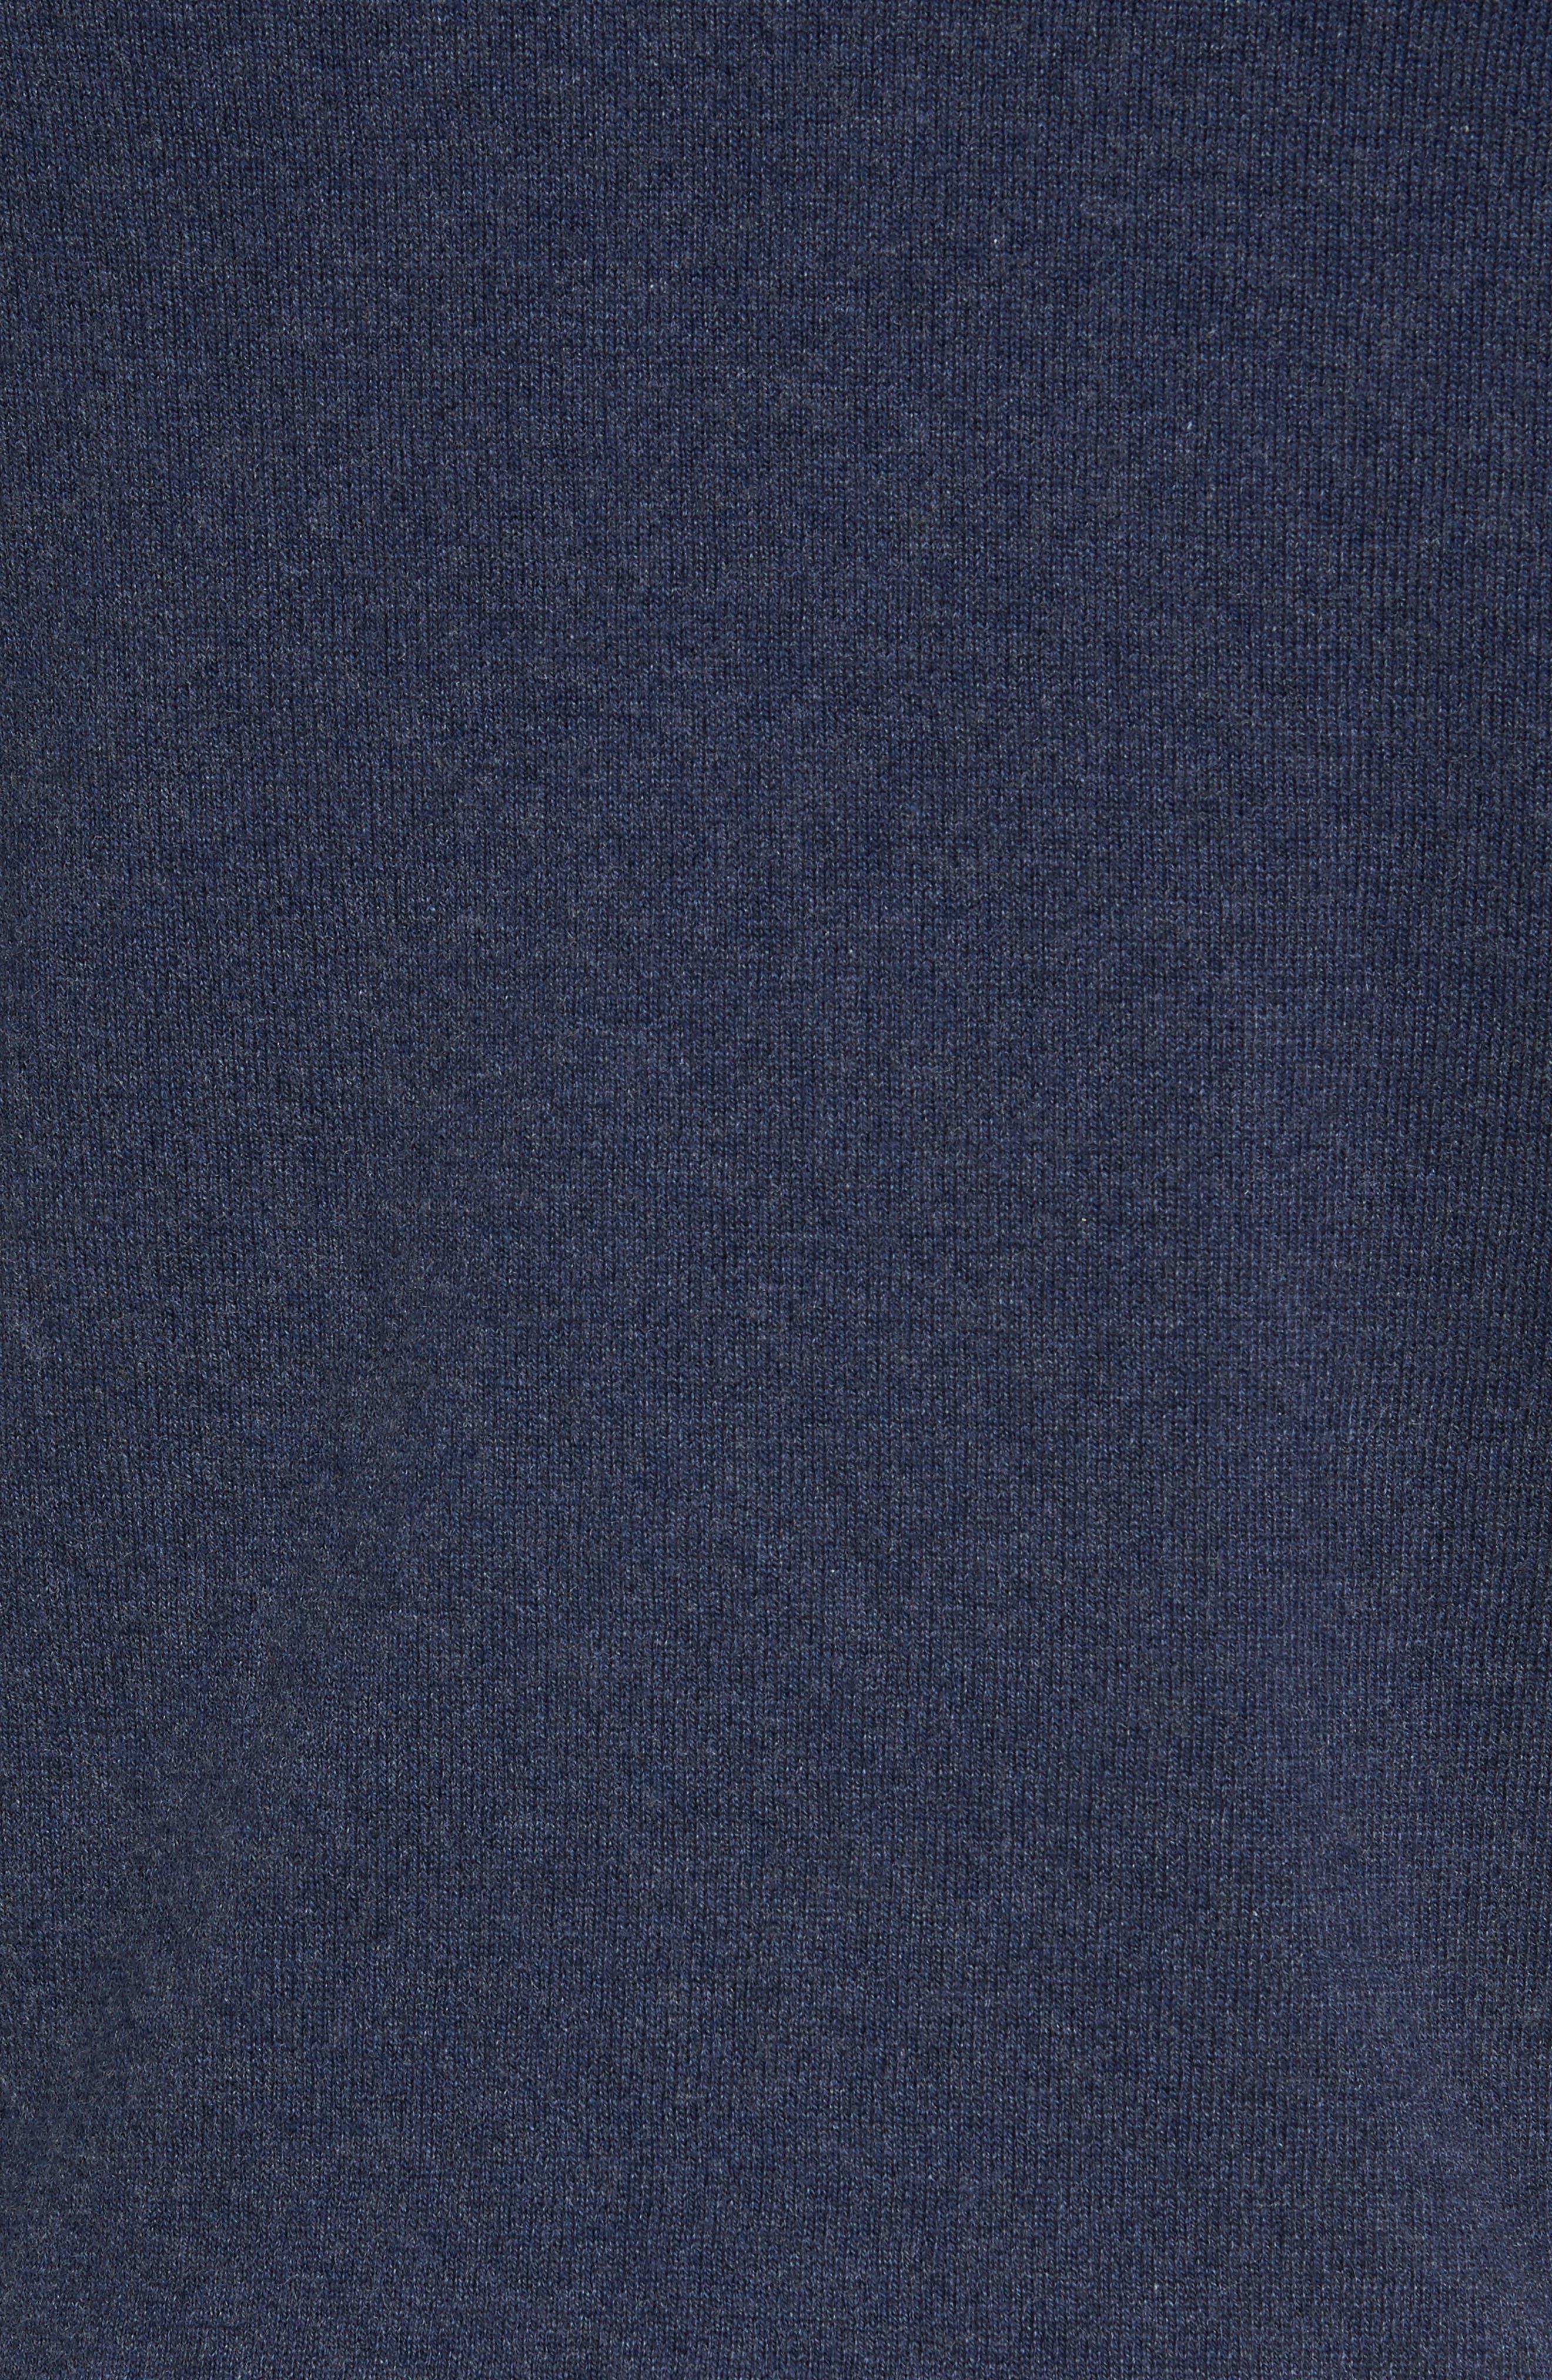 Men's Shop Shawl Collar Sweater,                             Alternate thumbnail 30, color,